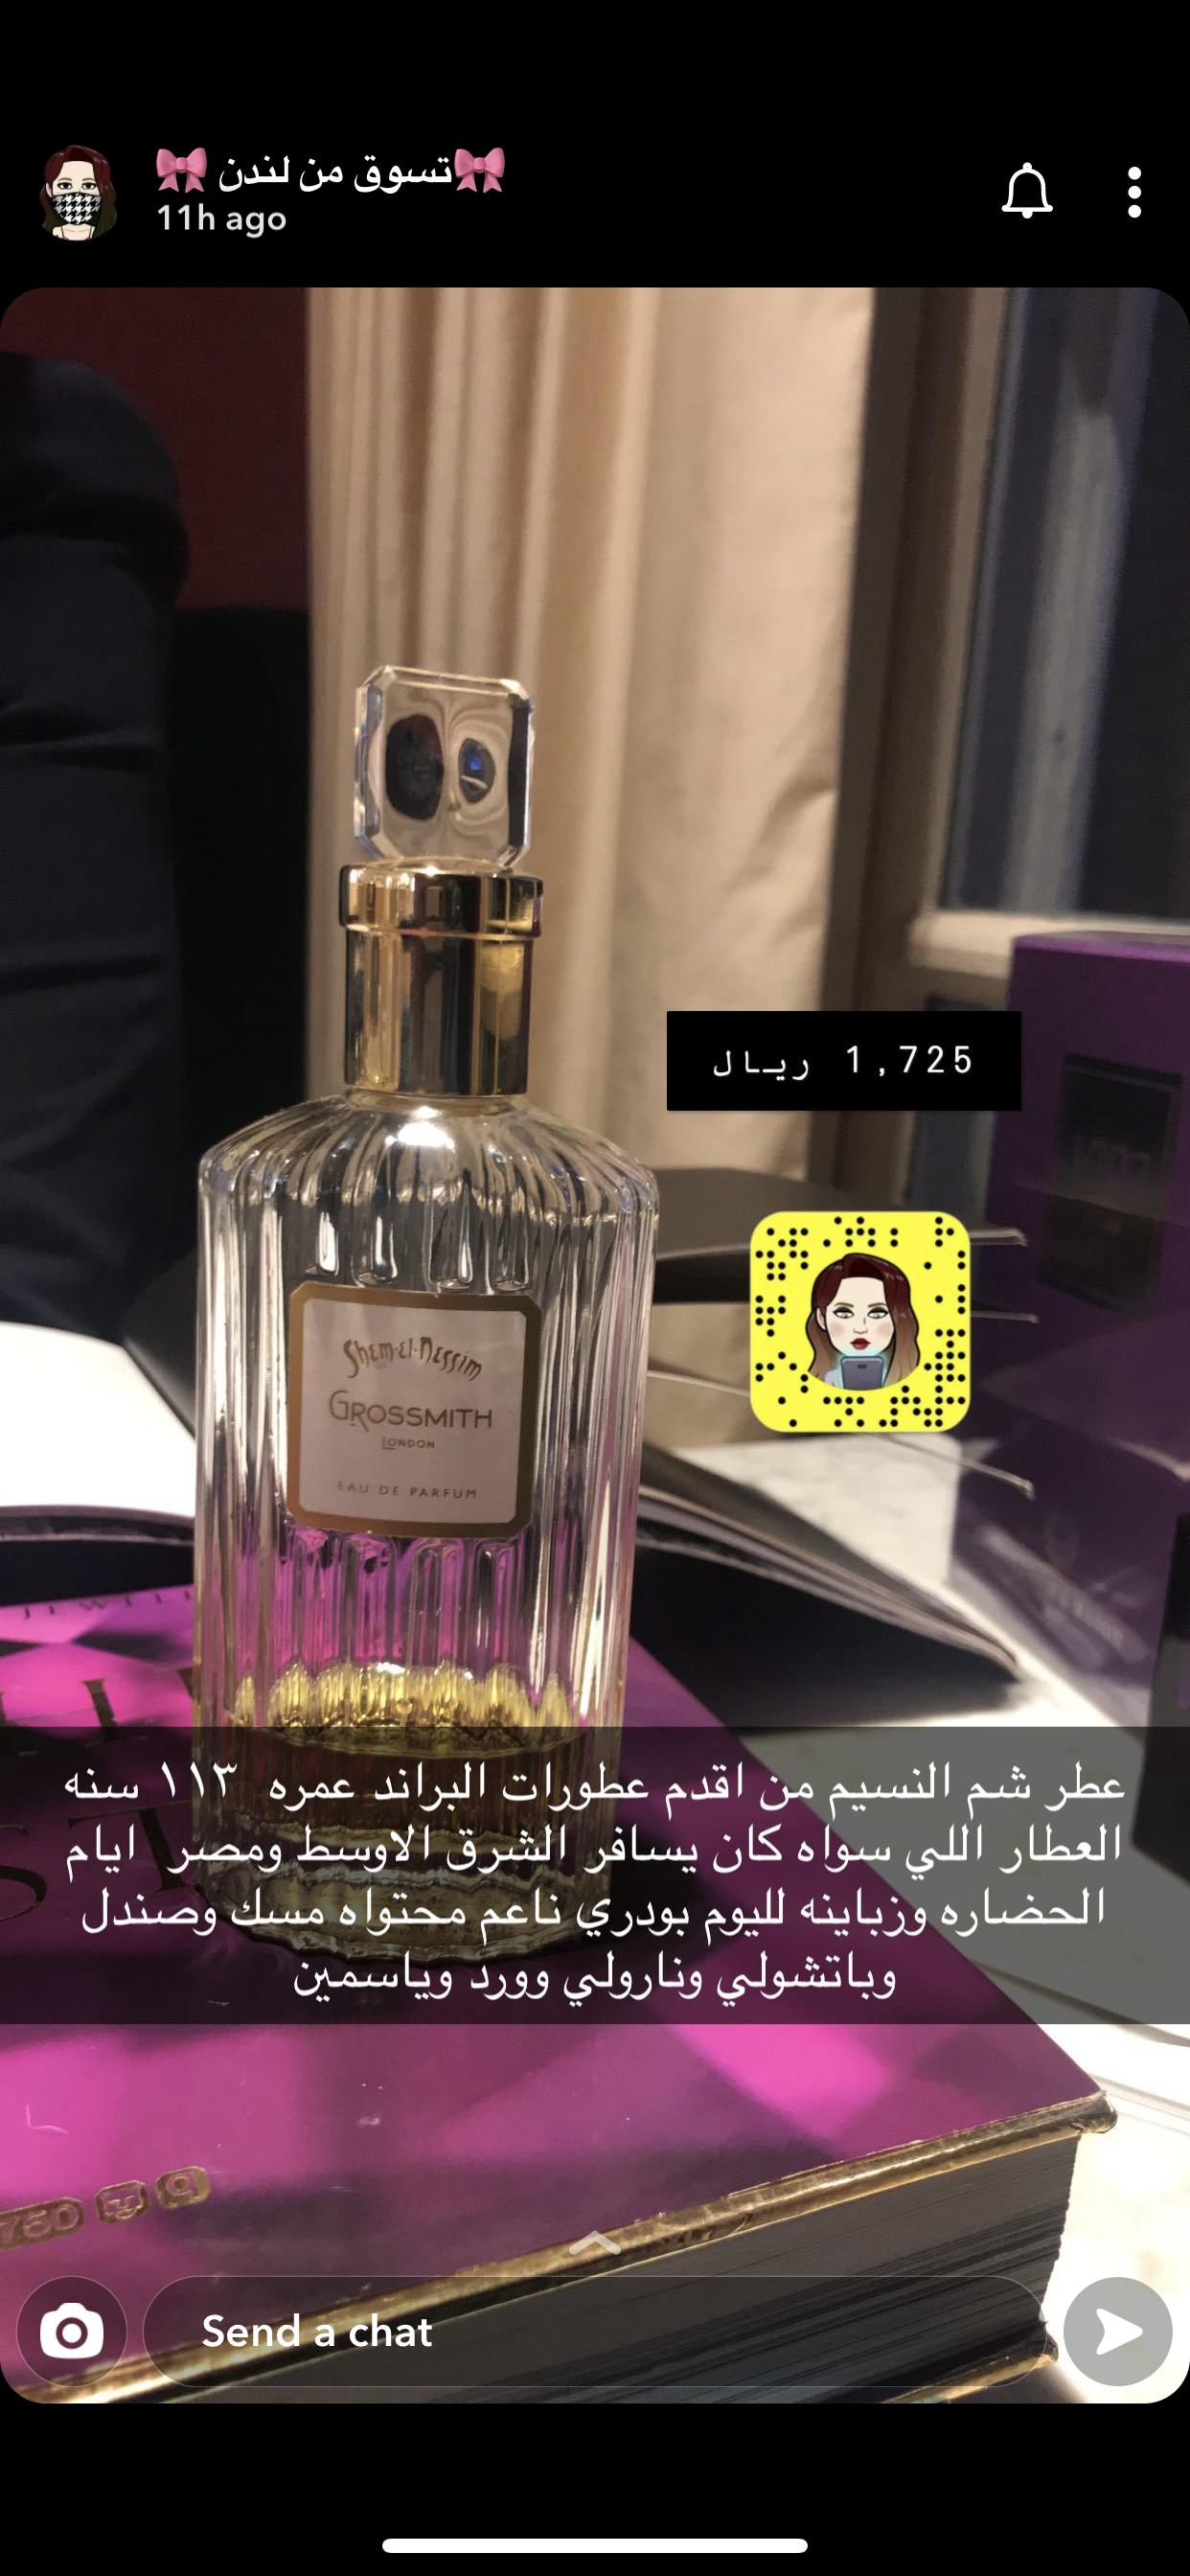 Pin By Samar Anan On عطور فرنسية Hair Perfume Perfume Perfume Bottles